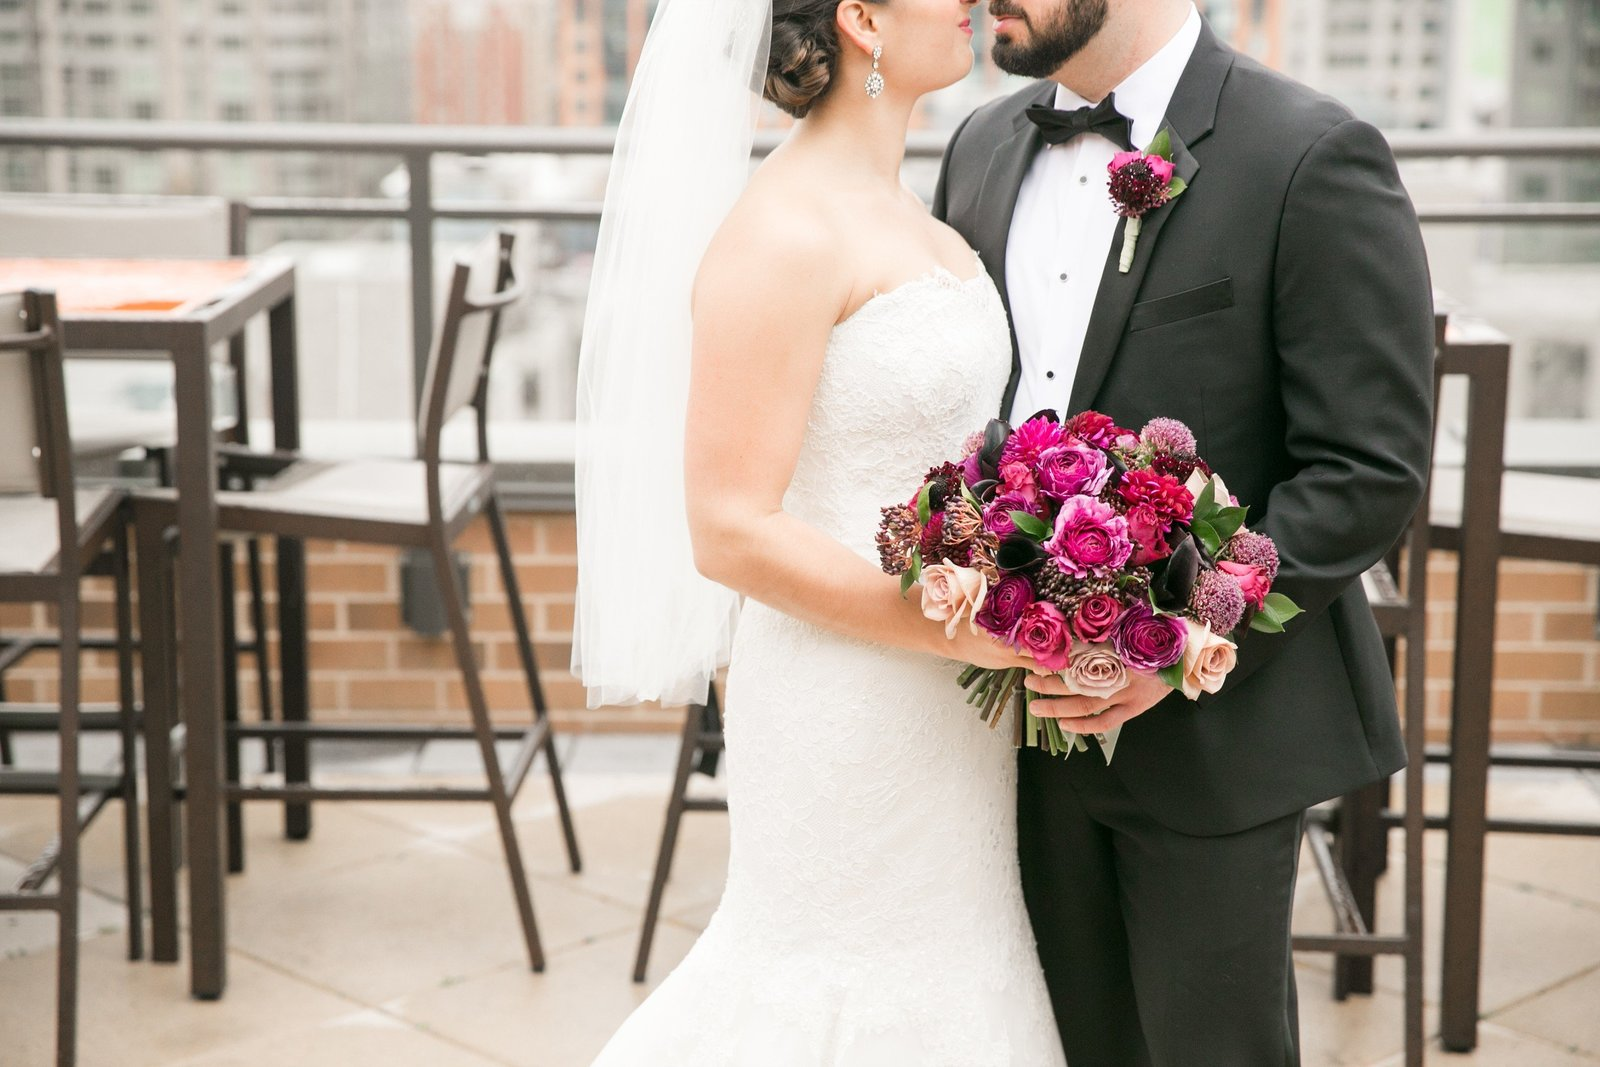 Black-tie-wedding-photos-longview-gallery-dc (139)